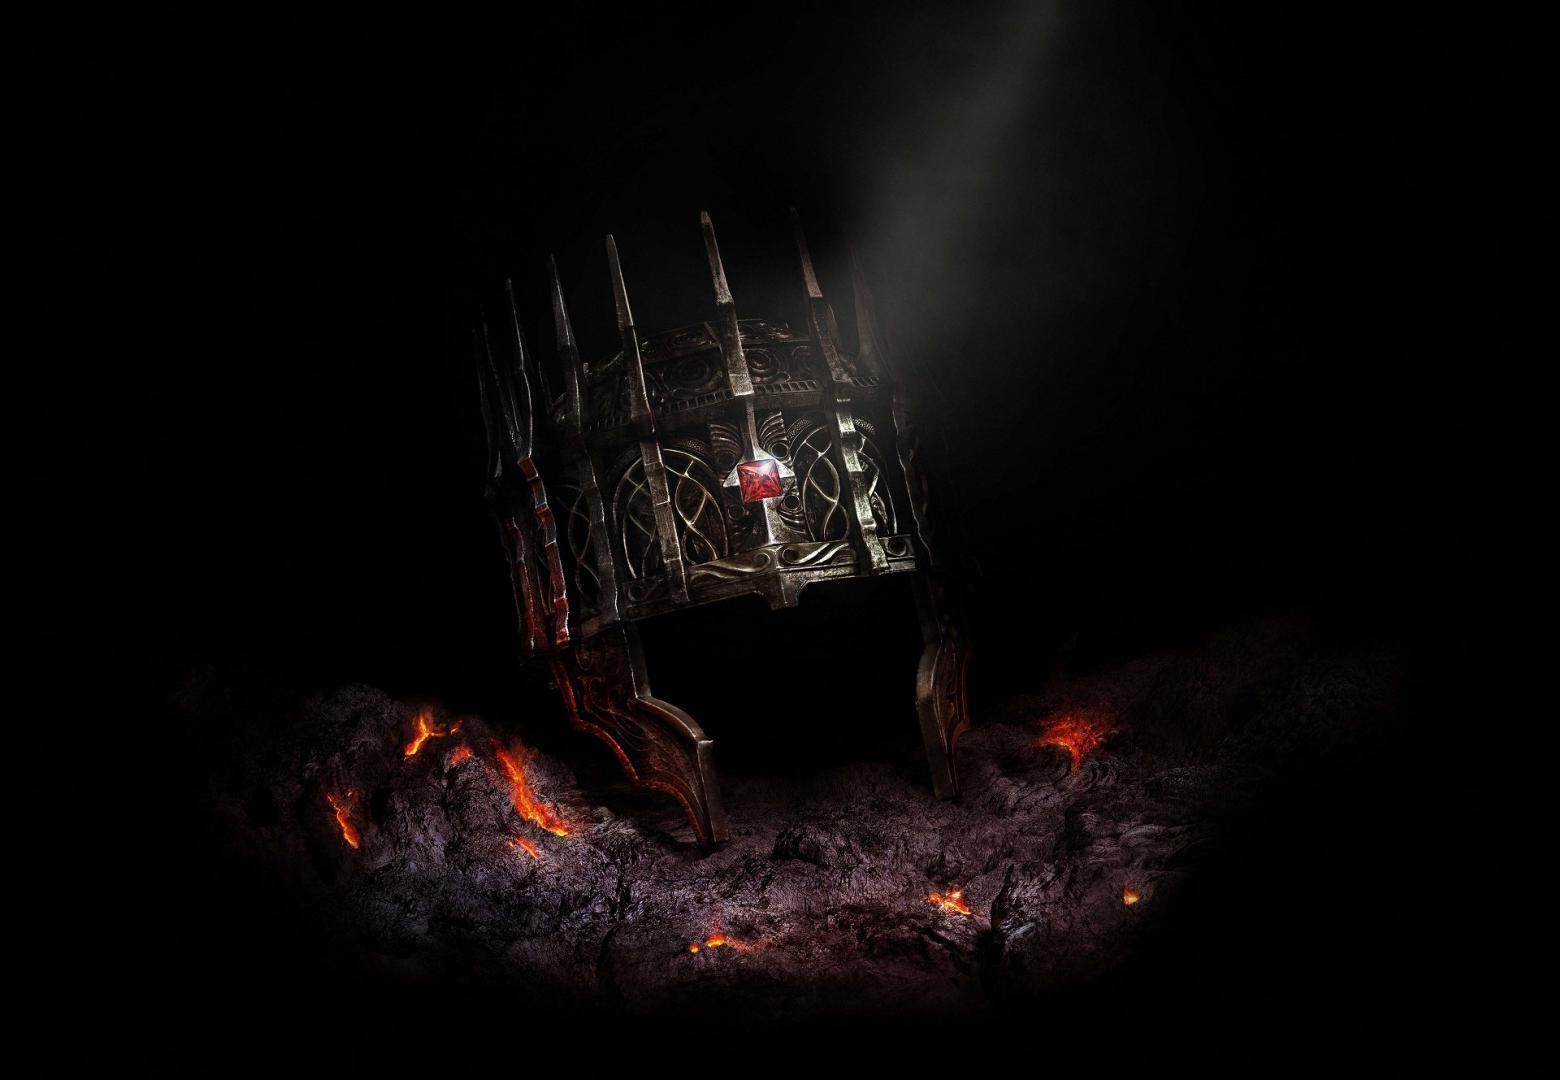 Wallpaper Video Games Night Dark Souls Ii Fire Campfire